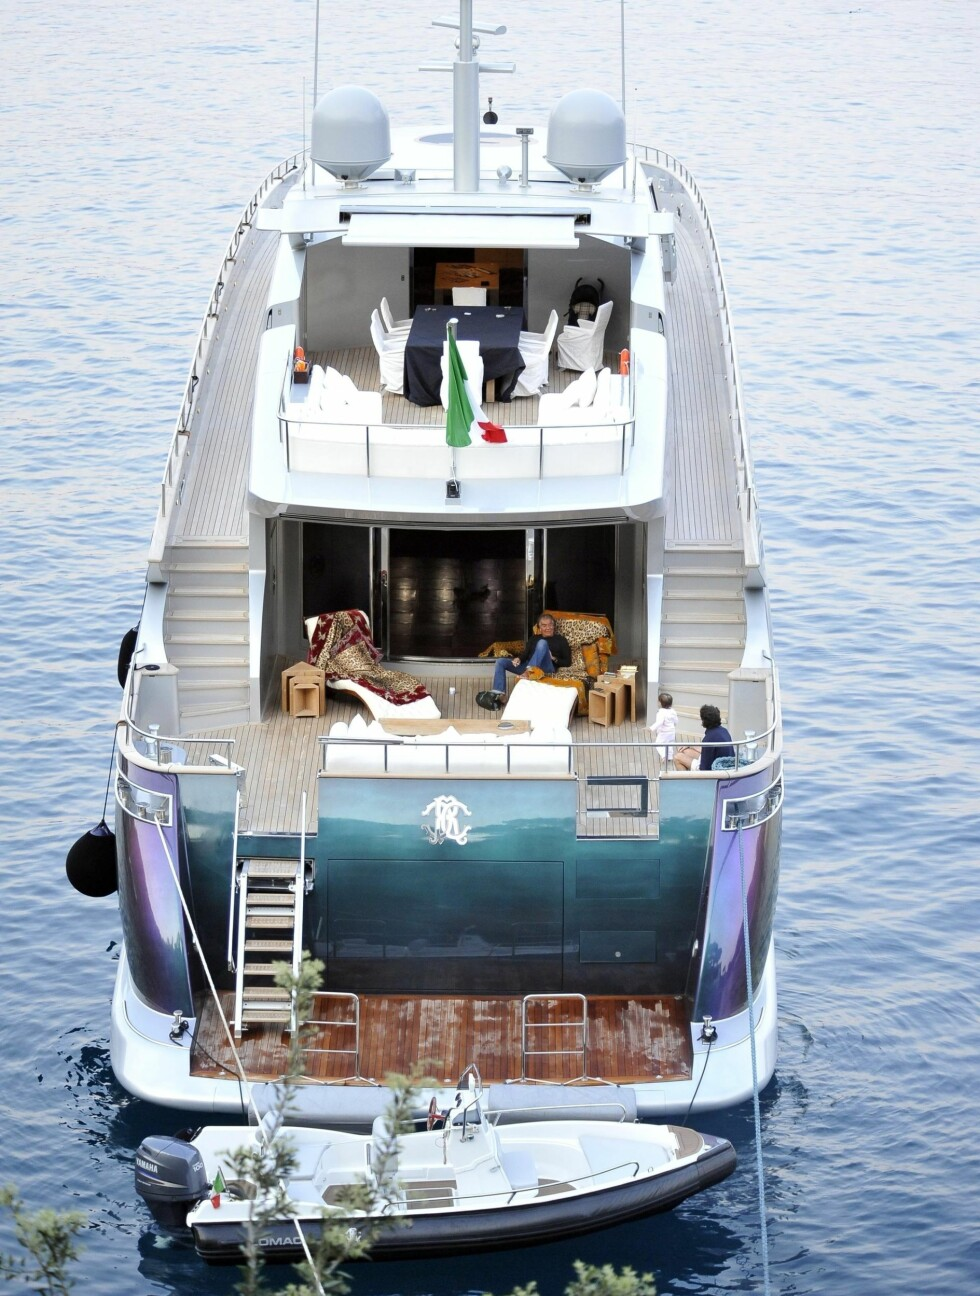 LUKSUS: Cavallis yacht er verdt over 240 millioner kroner og skifter farge i ulikt lys.  Foto: Fame Flynet